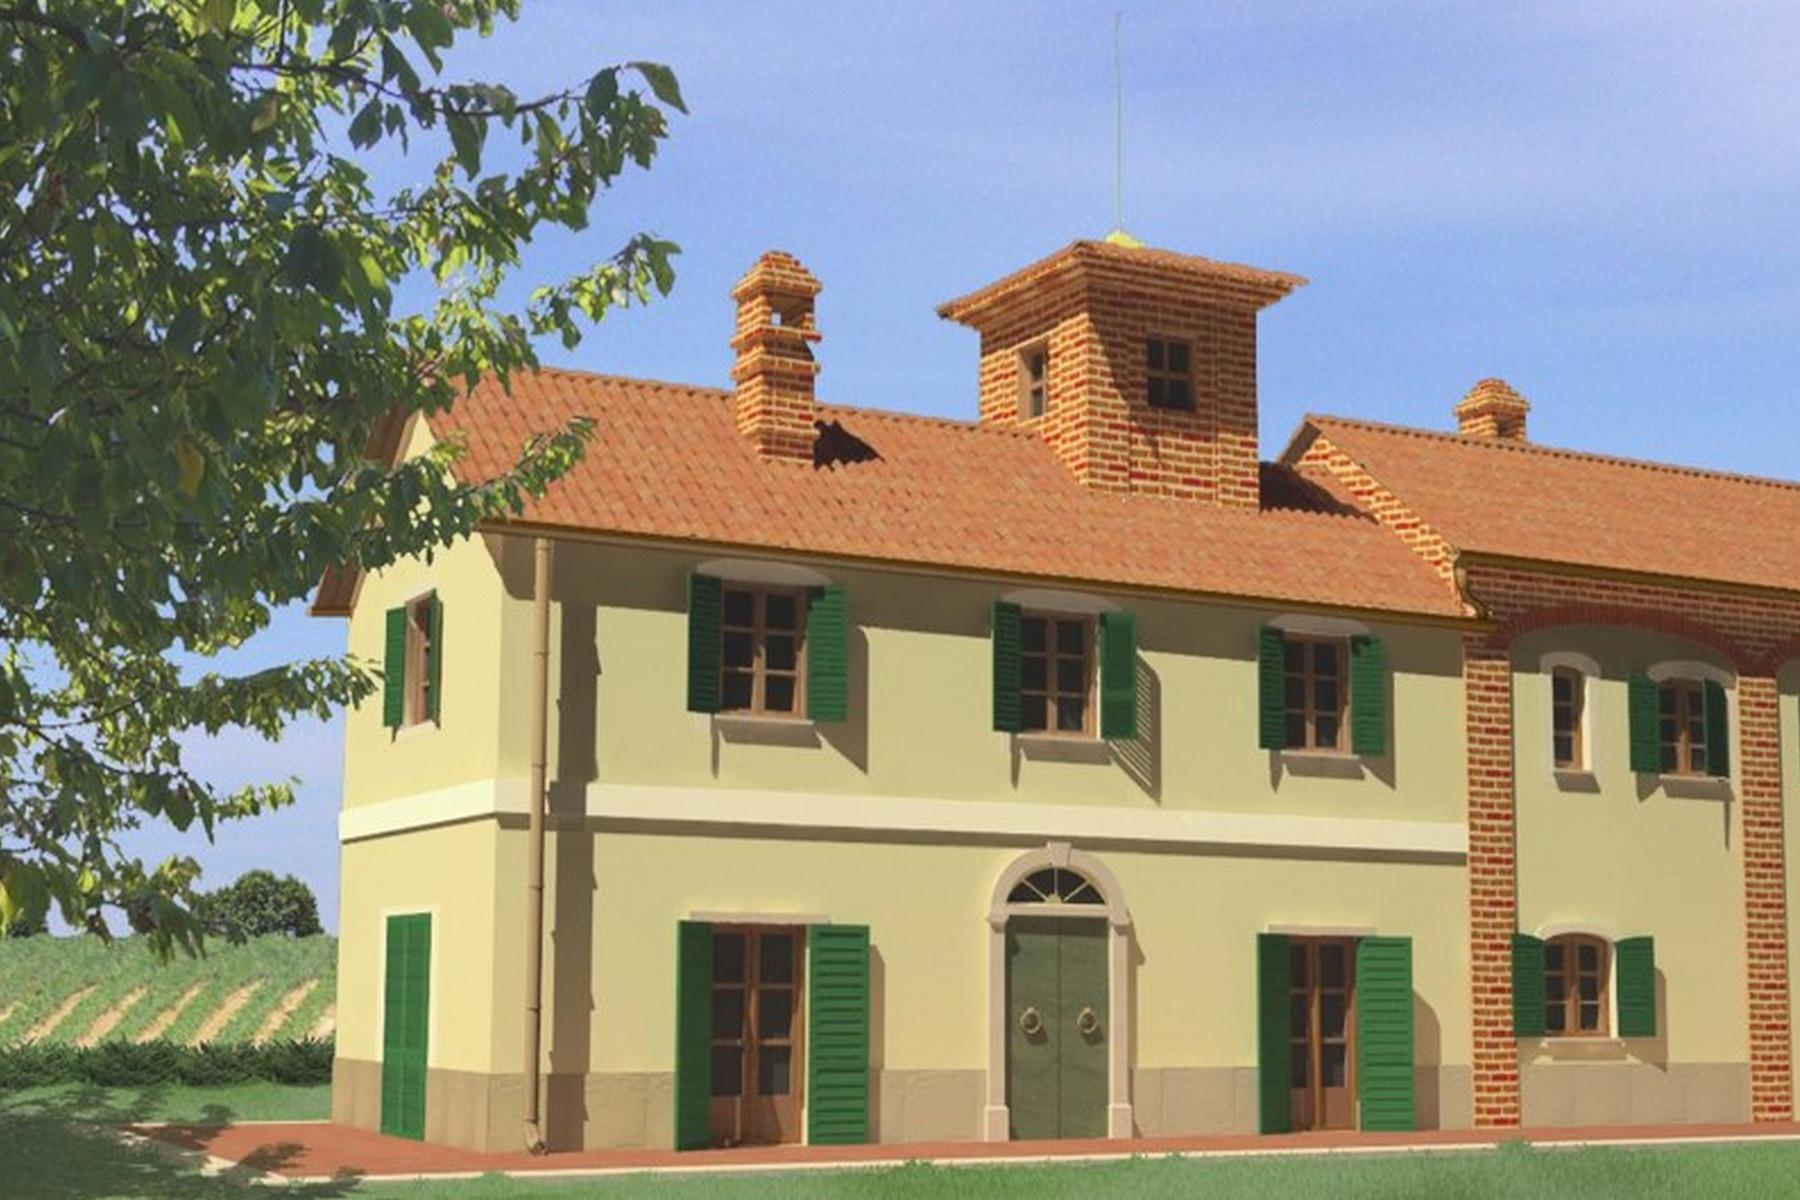 Rustico in Vendita a Novi Ligure: 5 locali, 300 mq - Foto 1